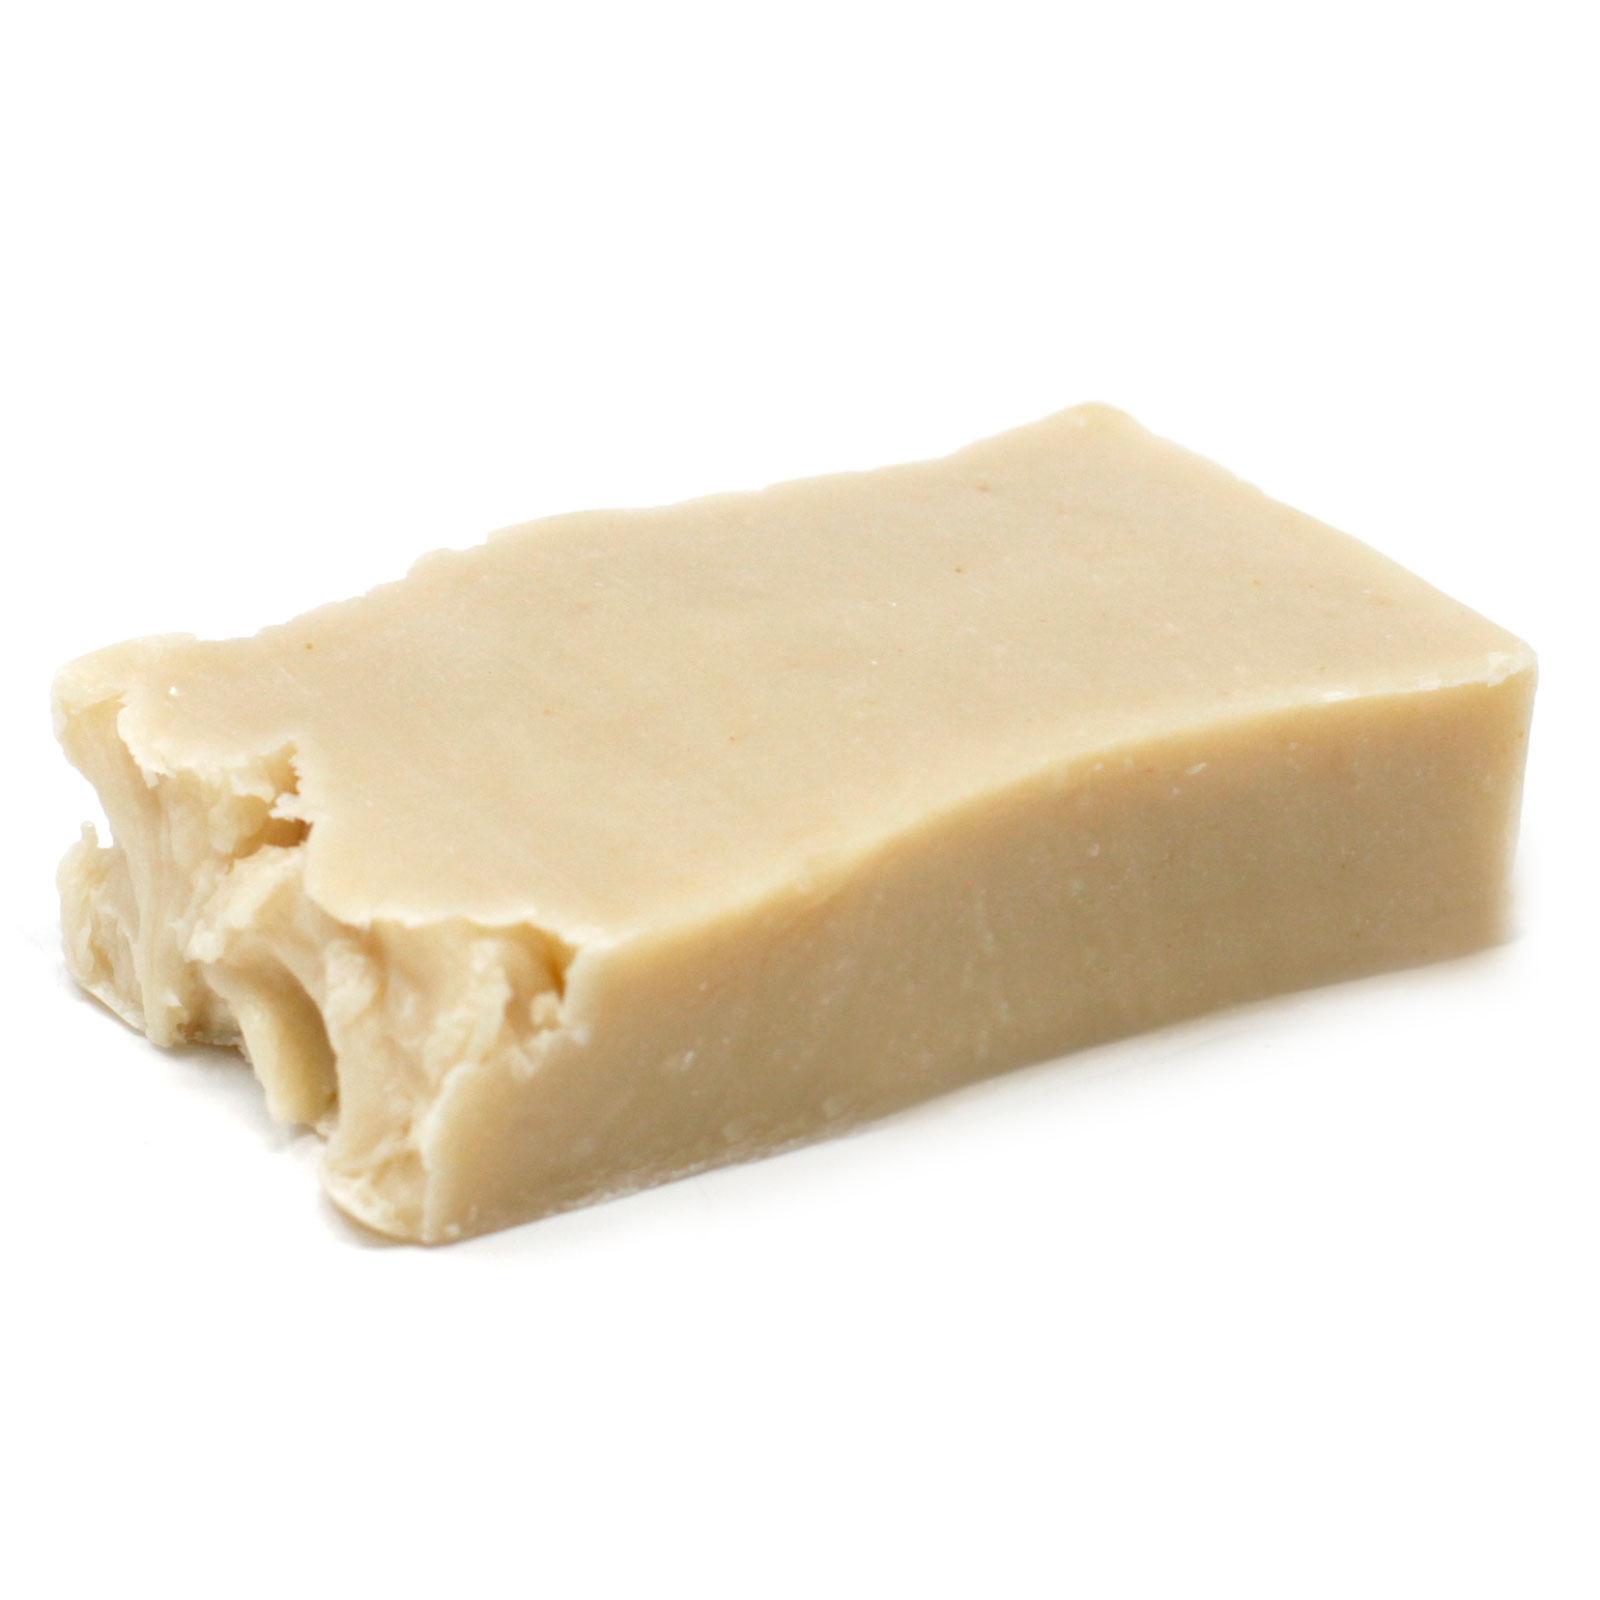 Donkey Milk Olive Oil Soap SLICE approx 100g